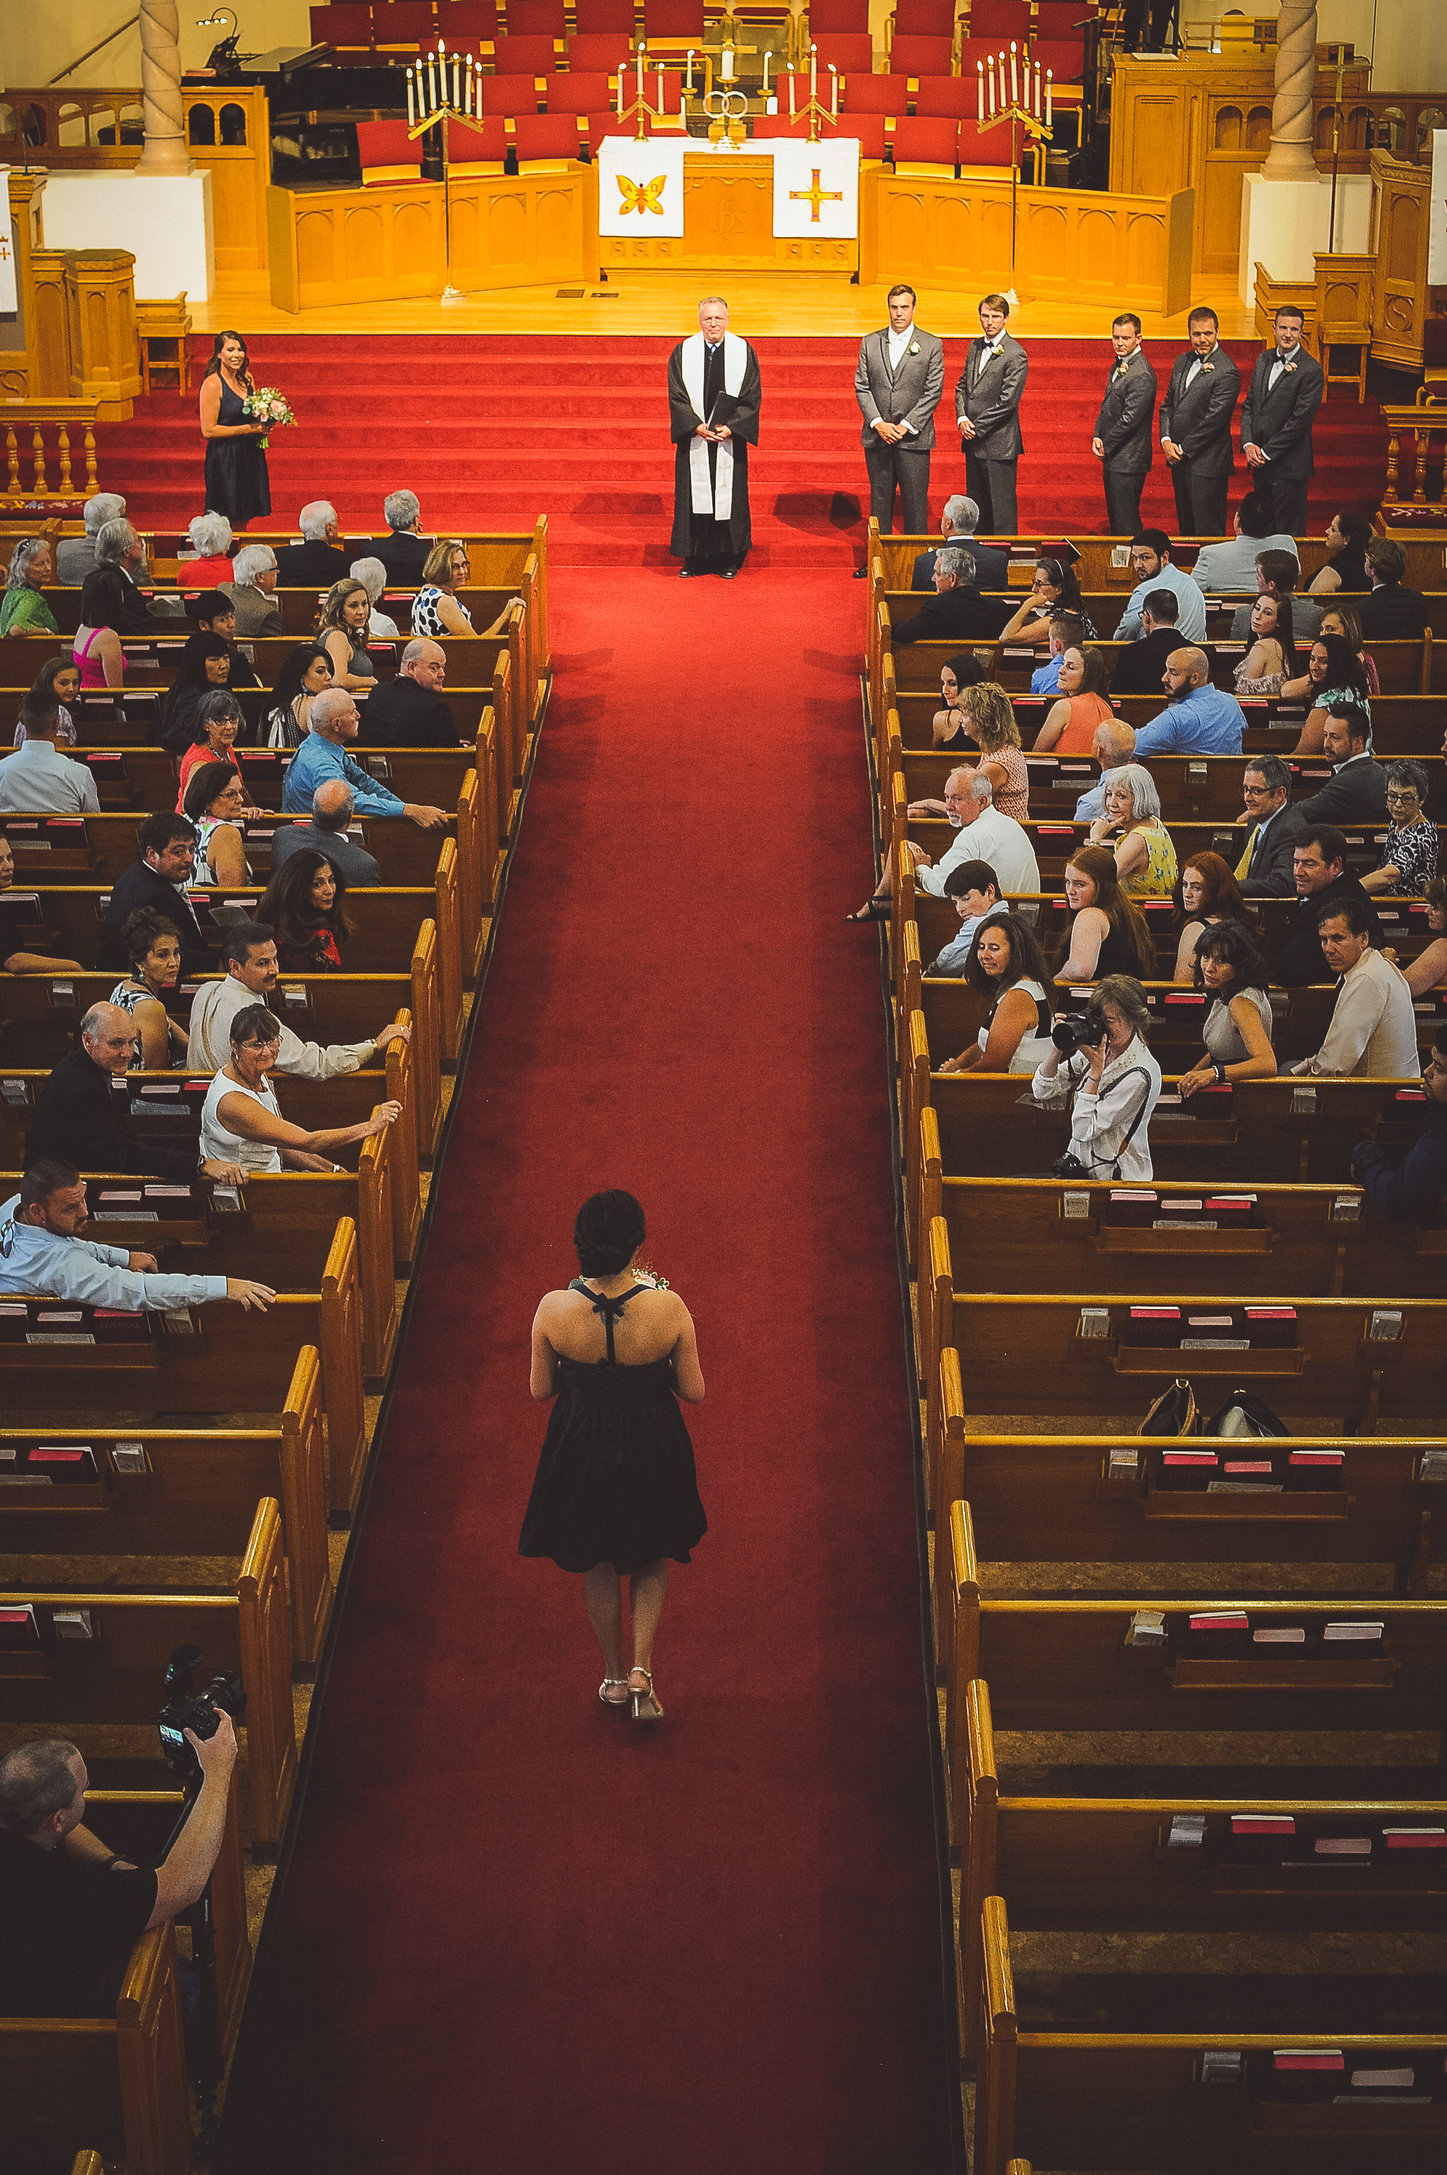 SandC-wedding-162.jpg